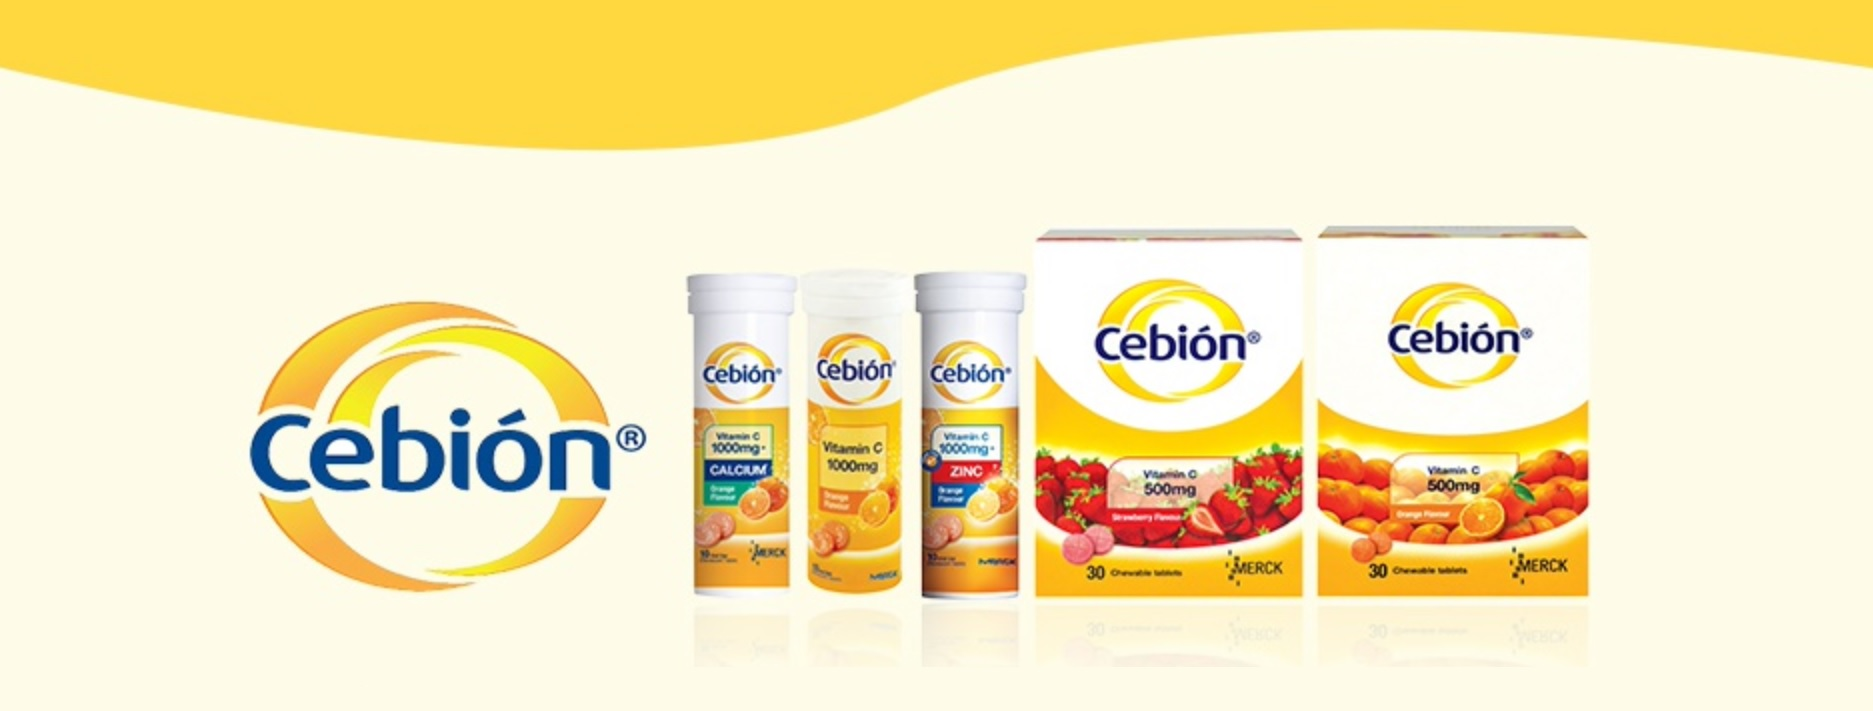 Cebion Vitamina C 1000mg